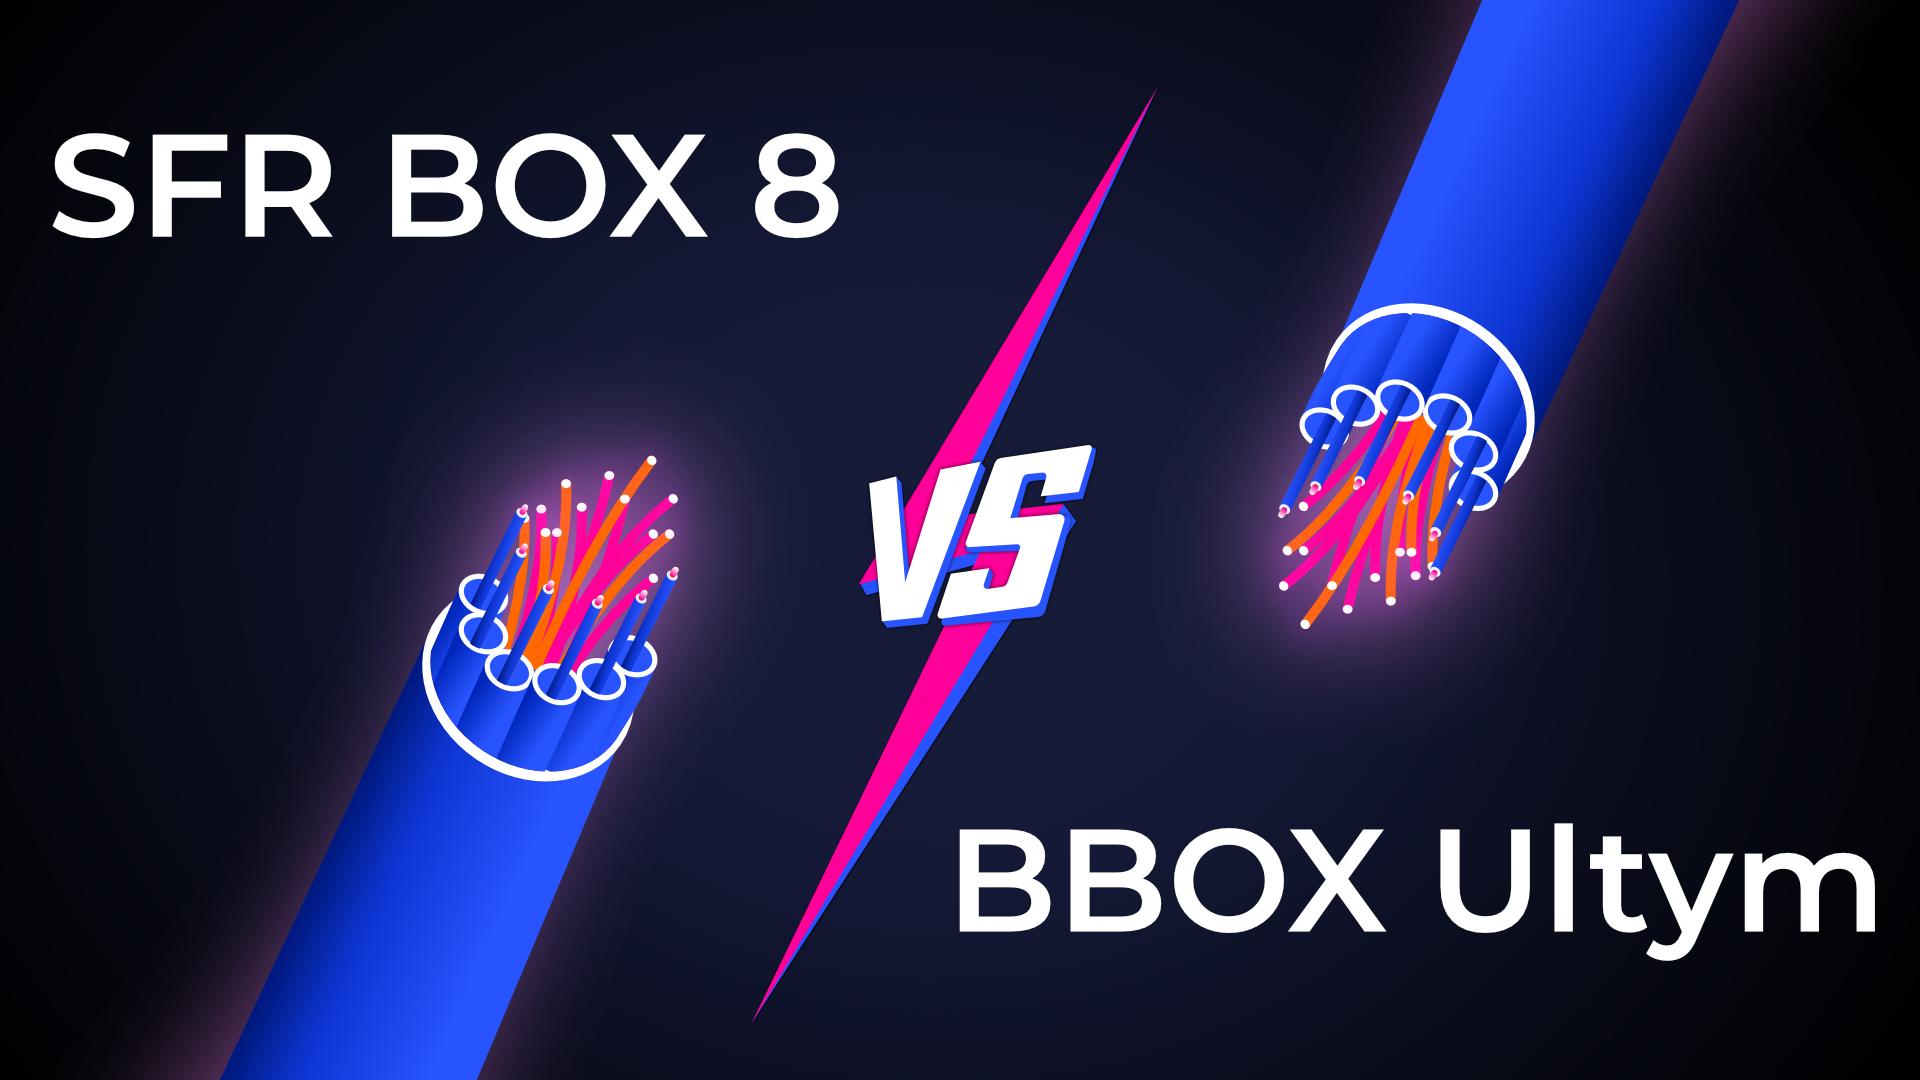 SFR Box 8 vs BBox Ultym : quelle box Wi-Fi 6 choisir ?